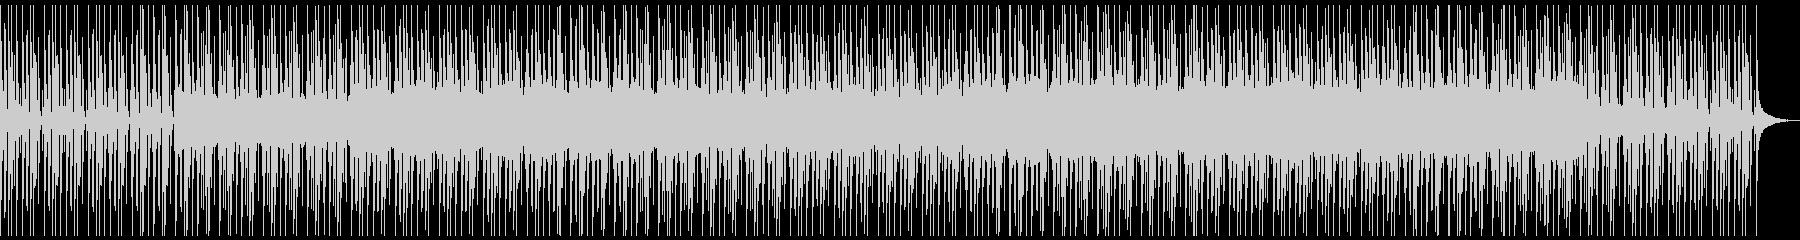 528Hz日常のストレス解放の瞑想曲3の未再生の波形